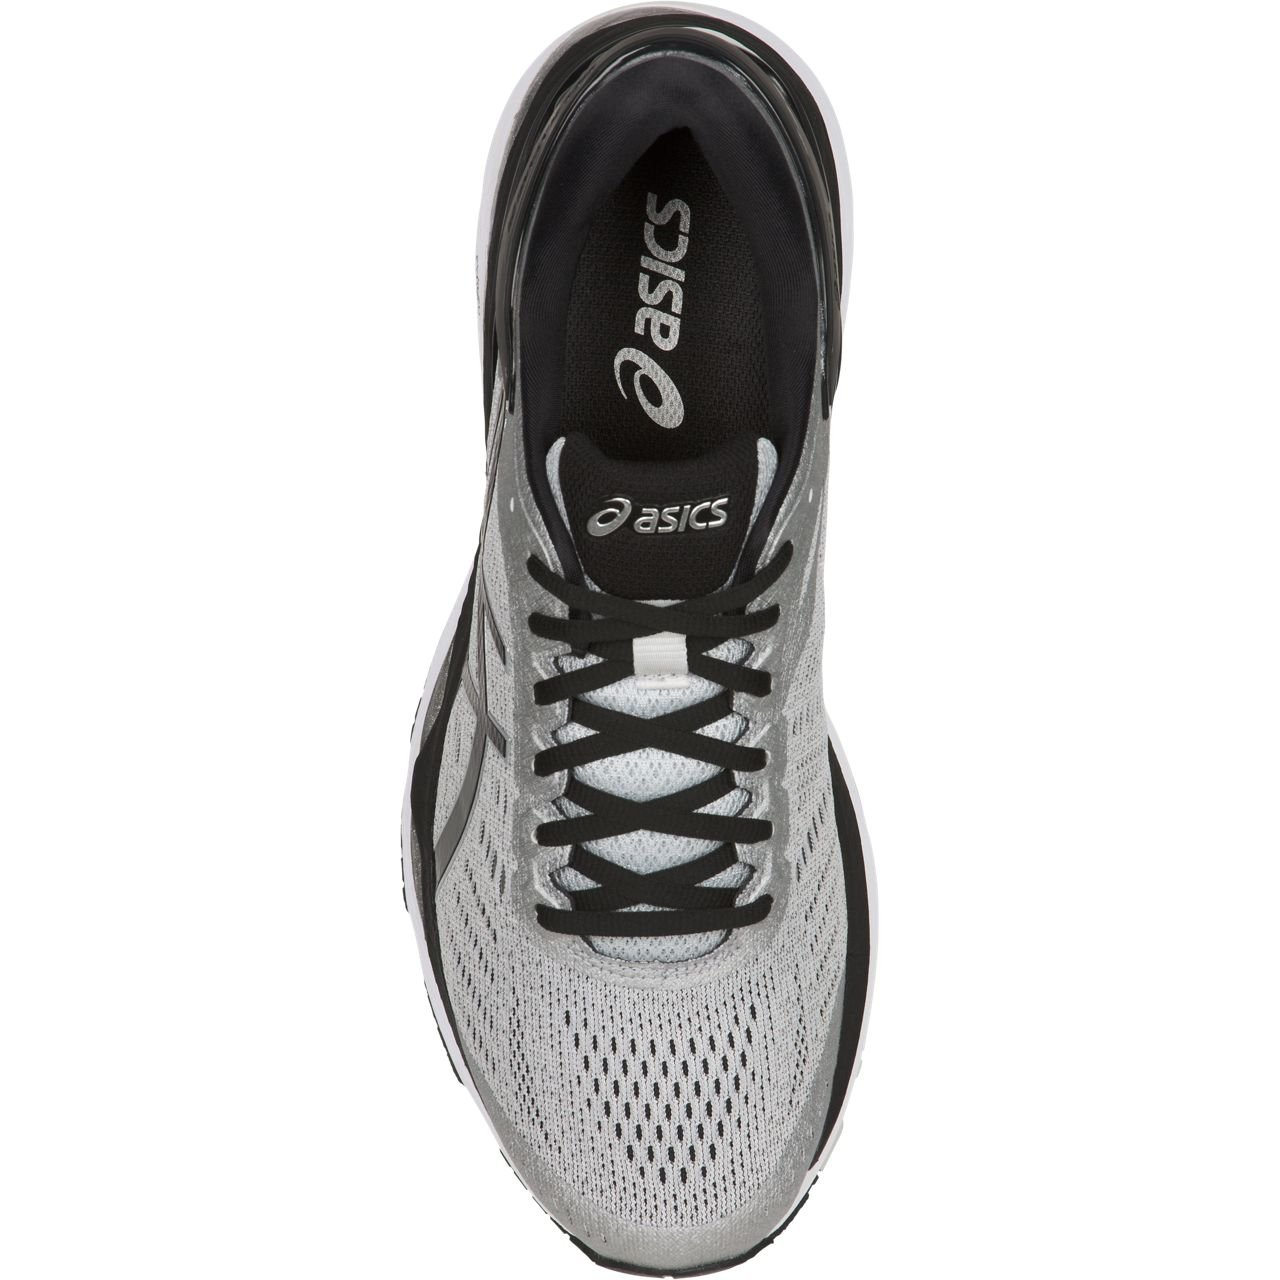 ASICS Mens Gel-Kayano 24 Running Shoe, Silver/Black/Mid Grey, 6 Medium US by ASICS (Image #4)